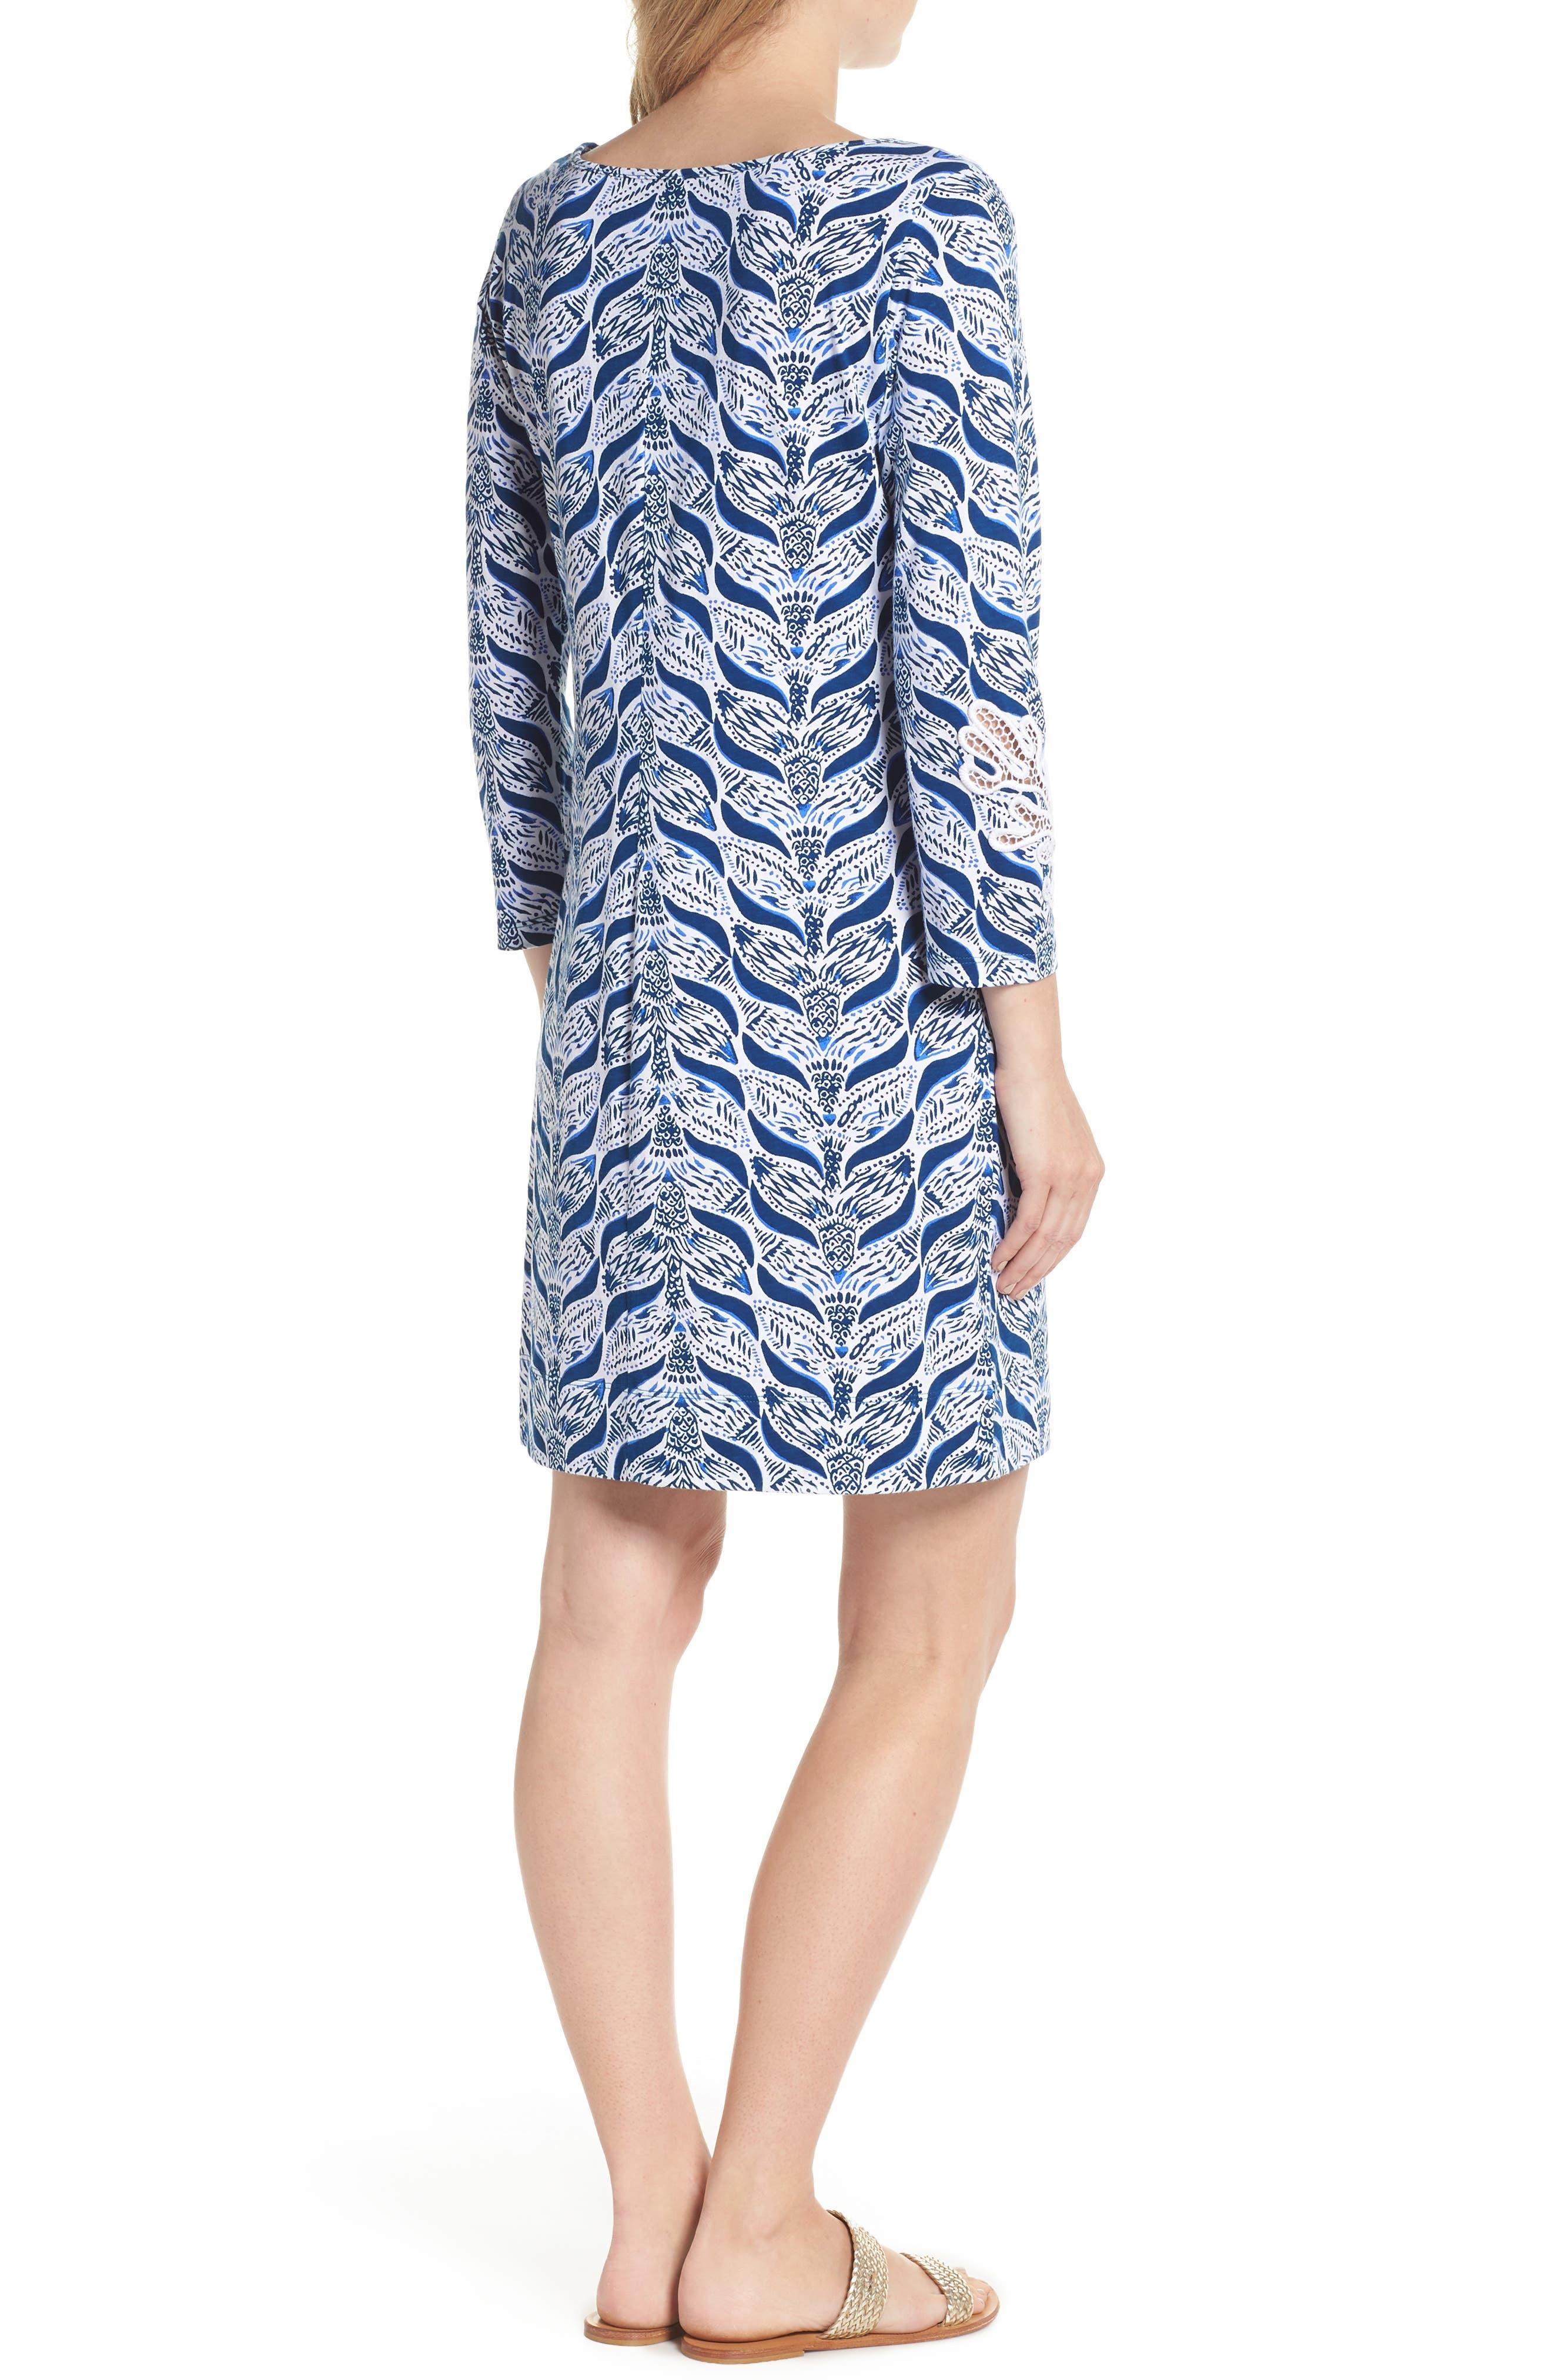 Marlowe T-Shirt Dress,                             Alternate thumbnail 2, color,                             Resort White A Mermaids Tail